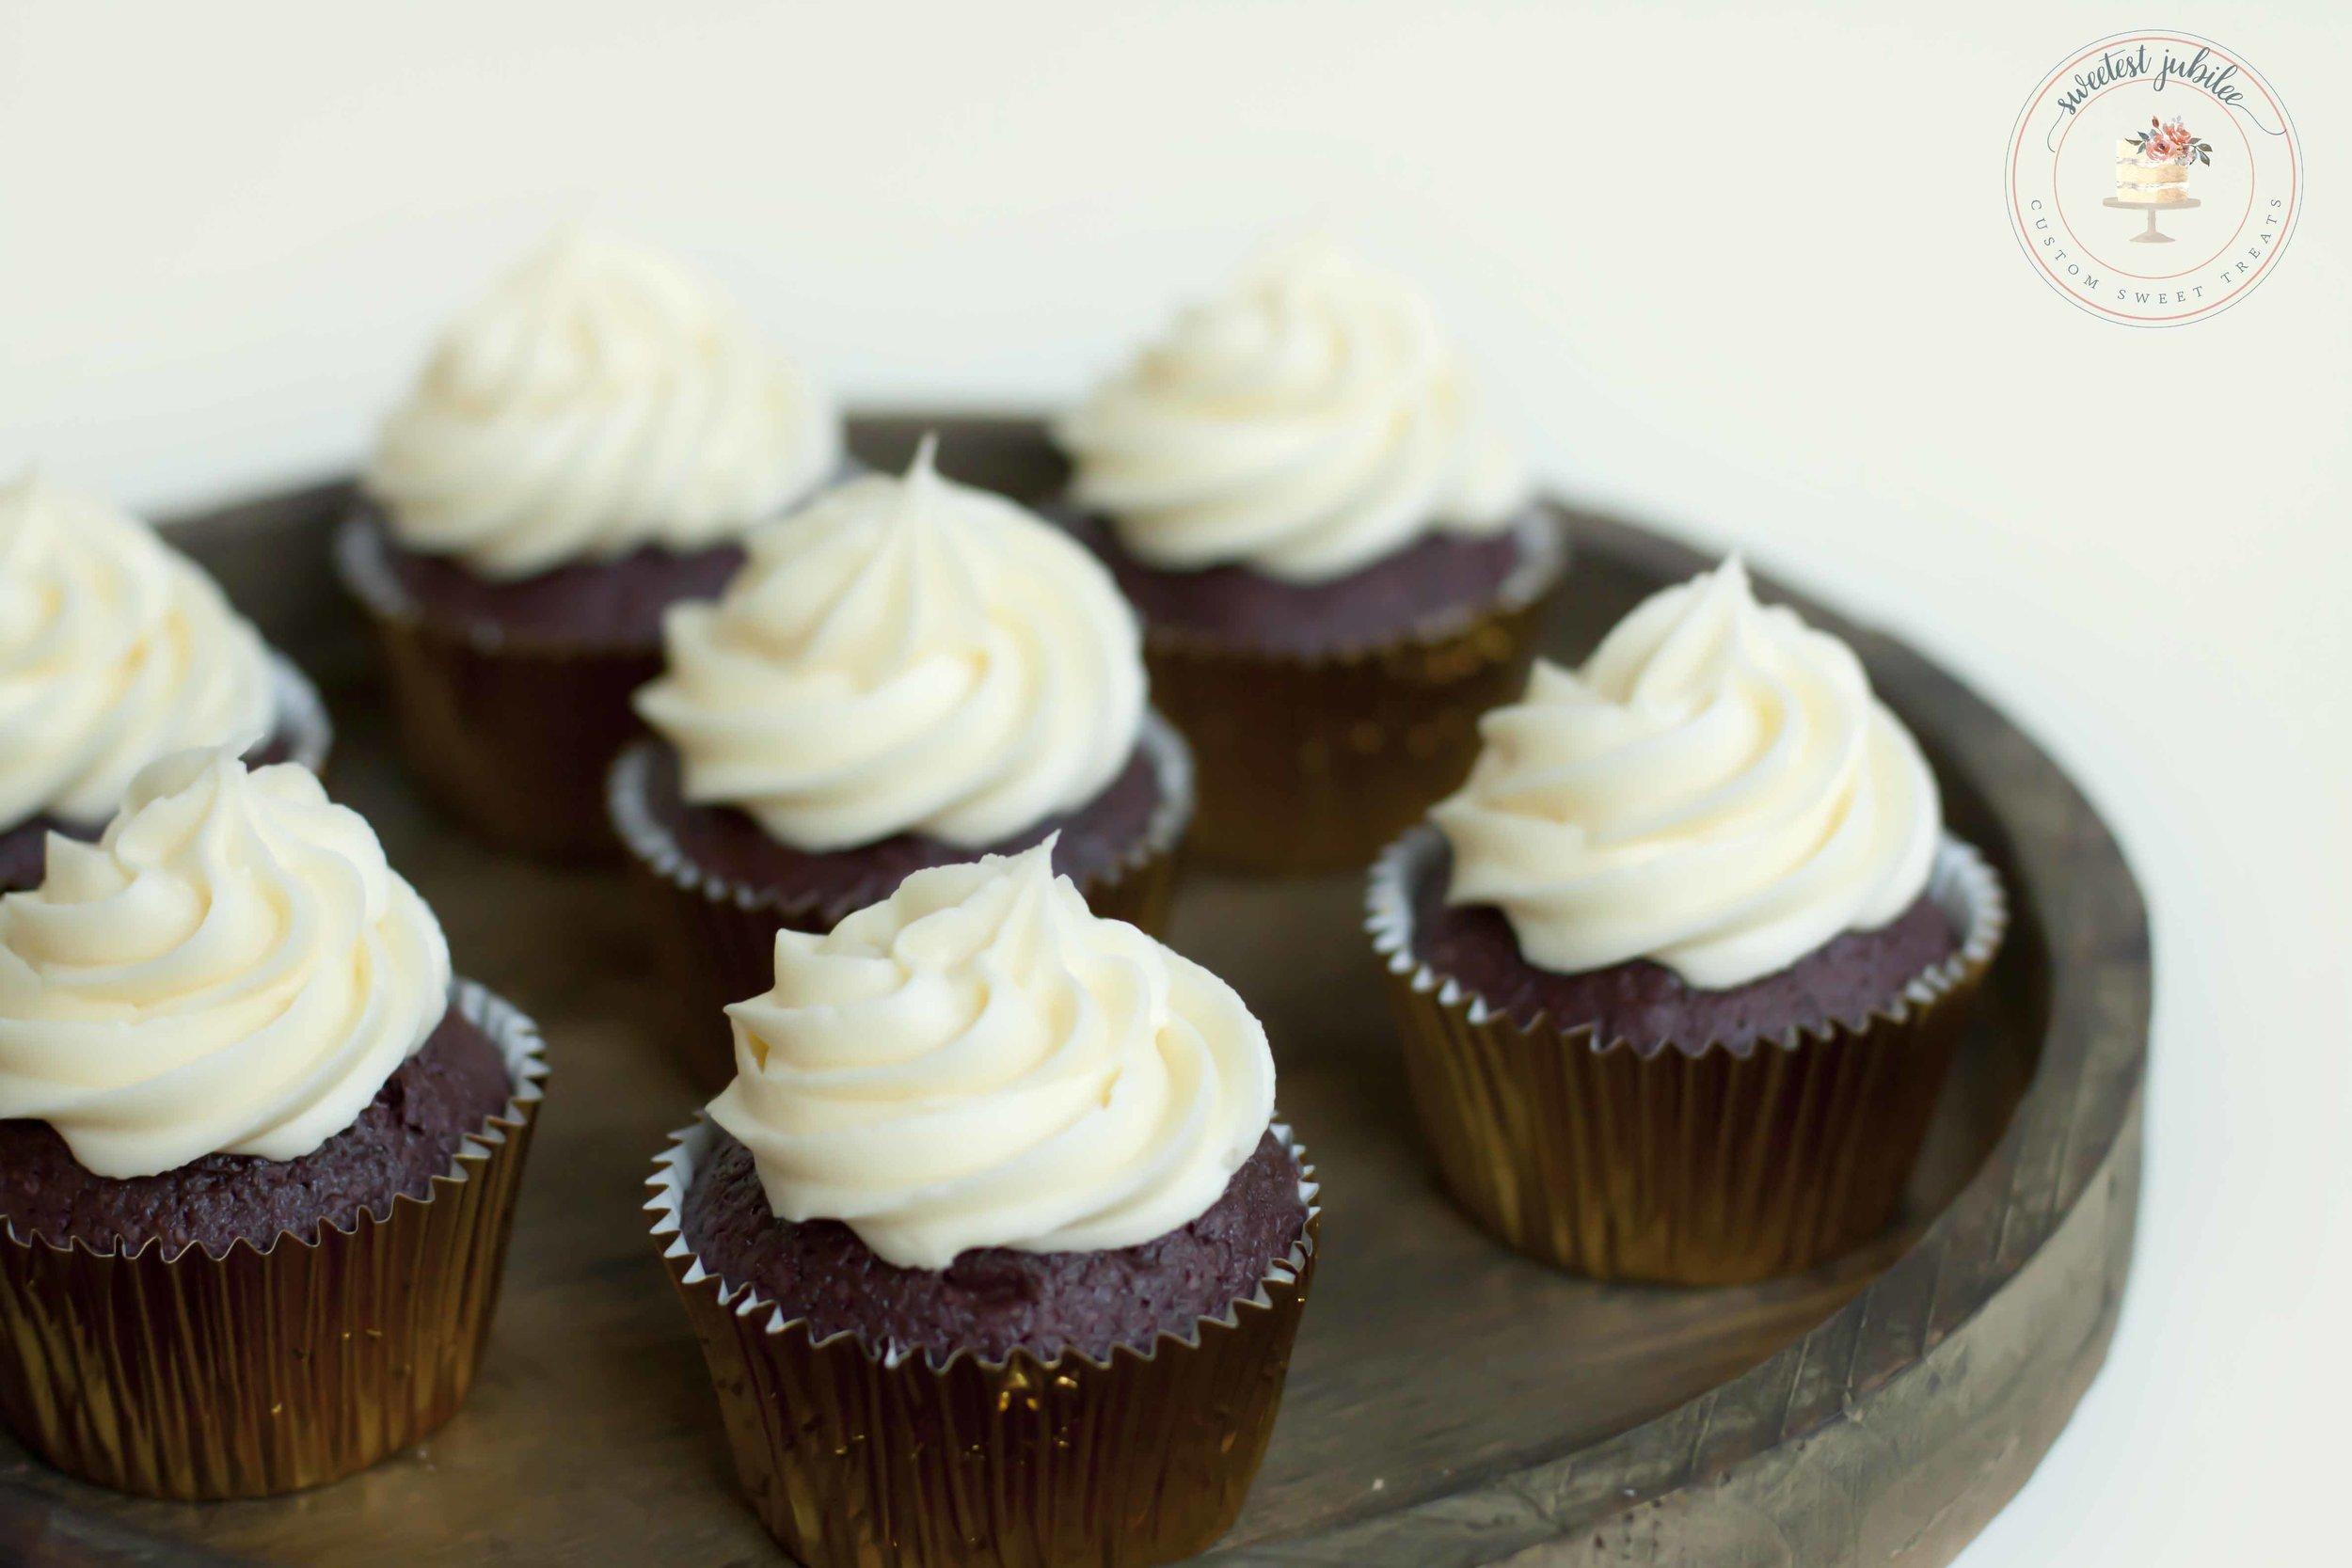 Belinda - cupcakes2.jpg